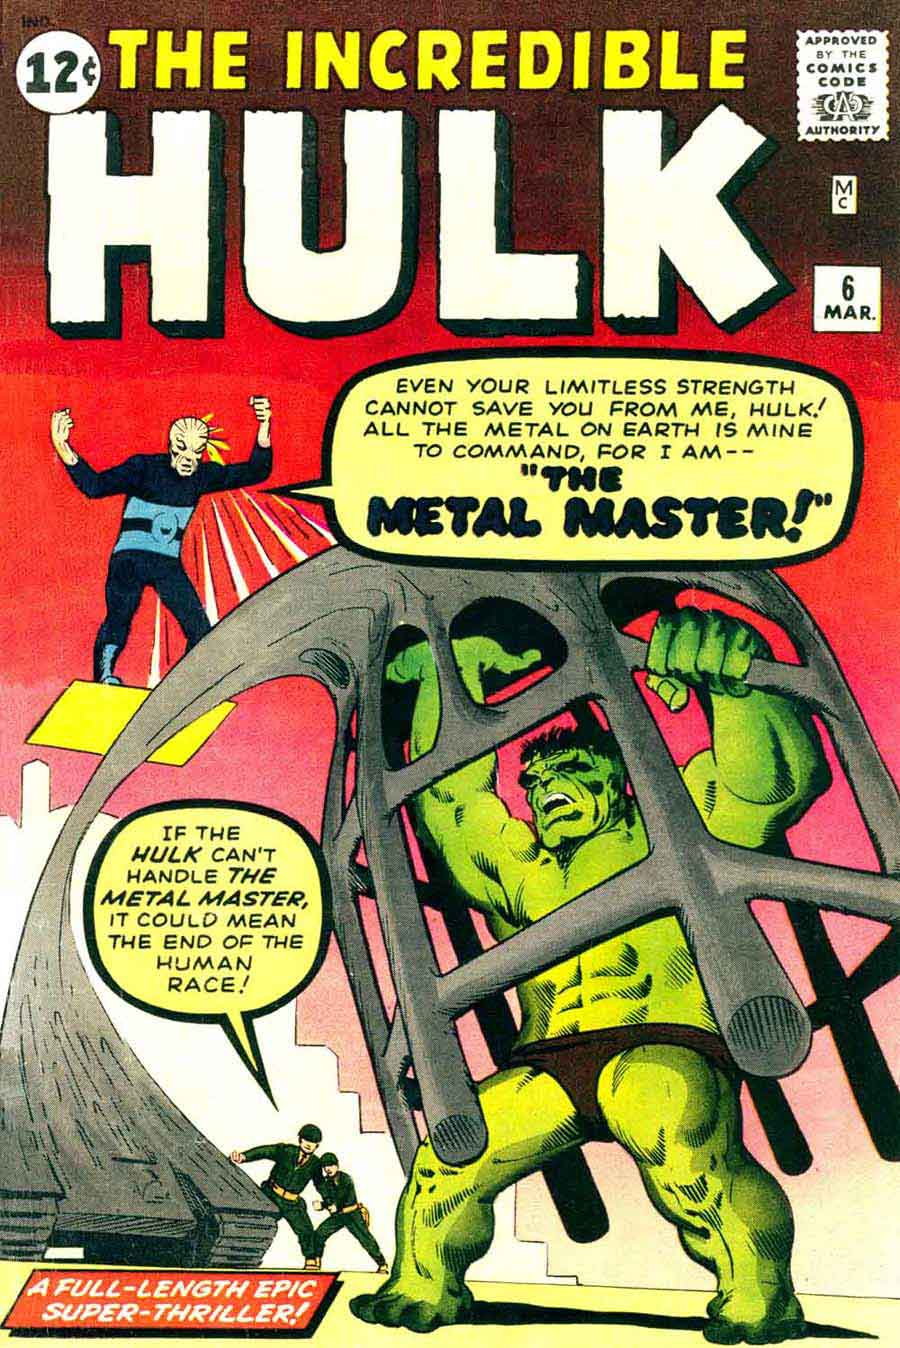 The Hulk Vs. The Metal Master